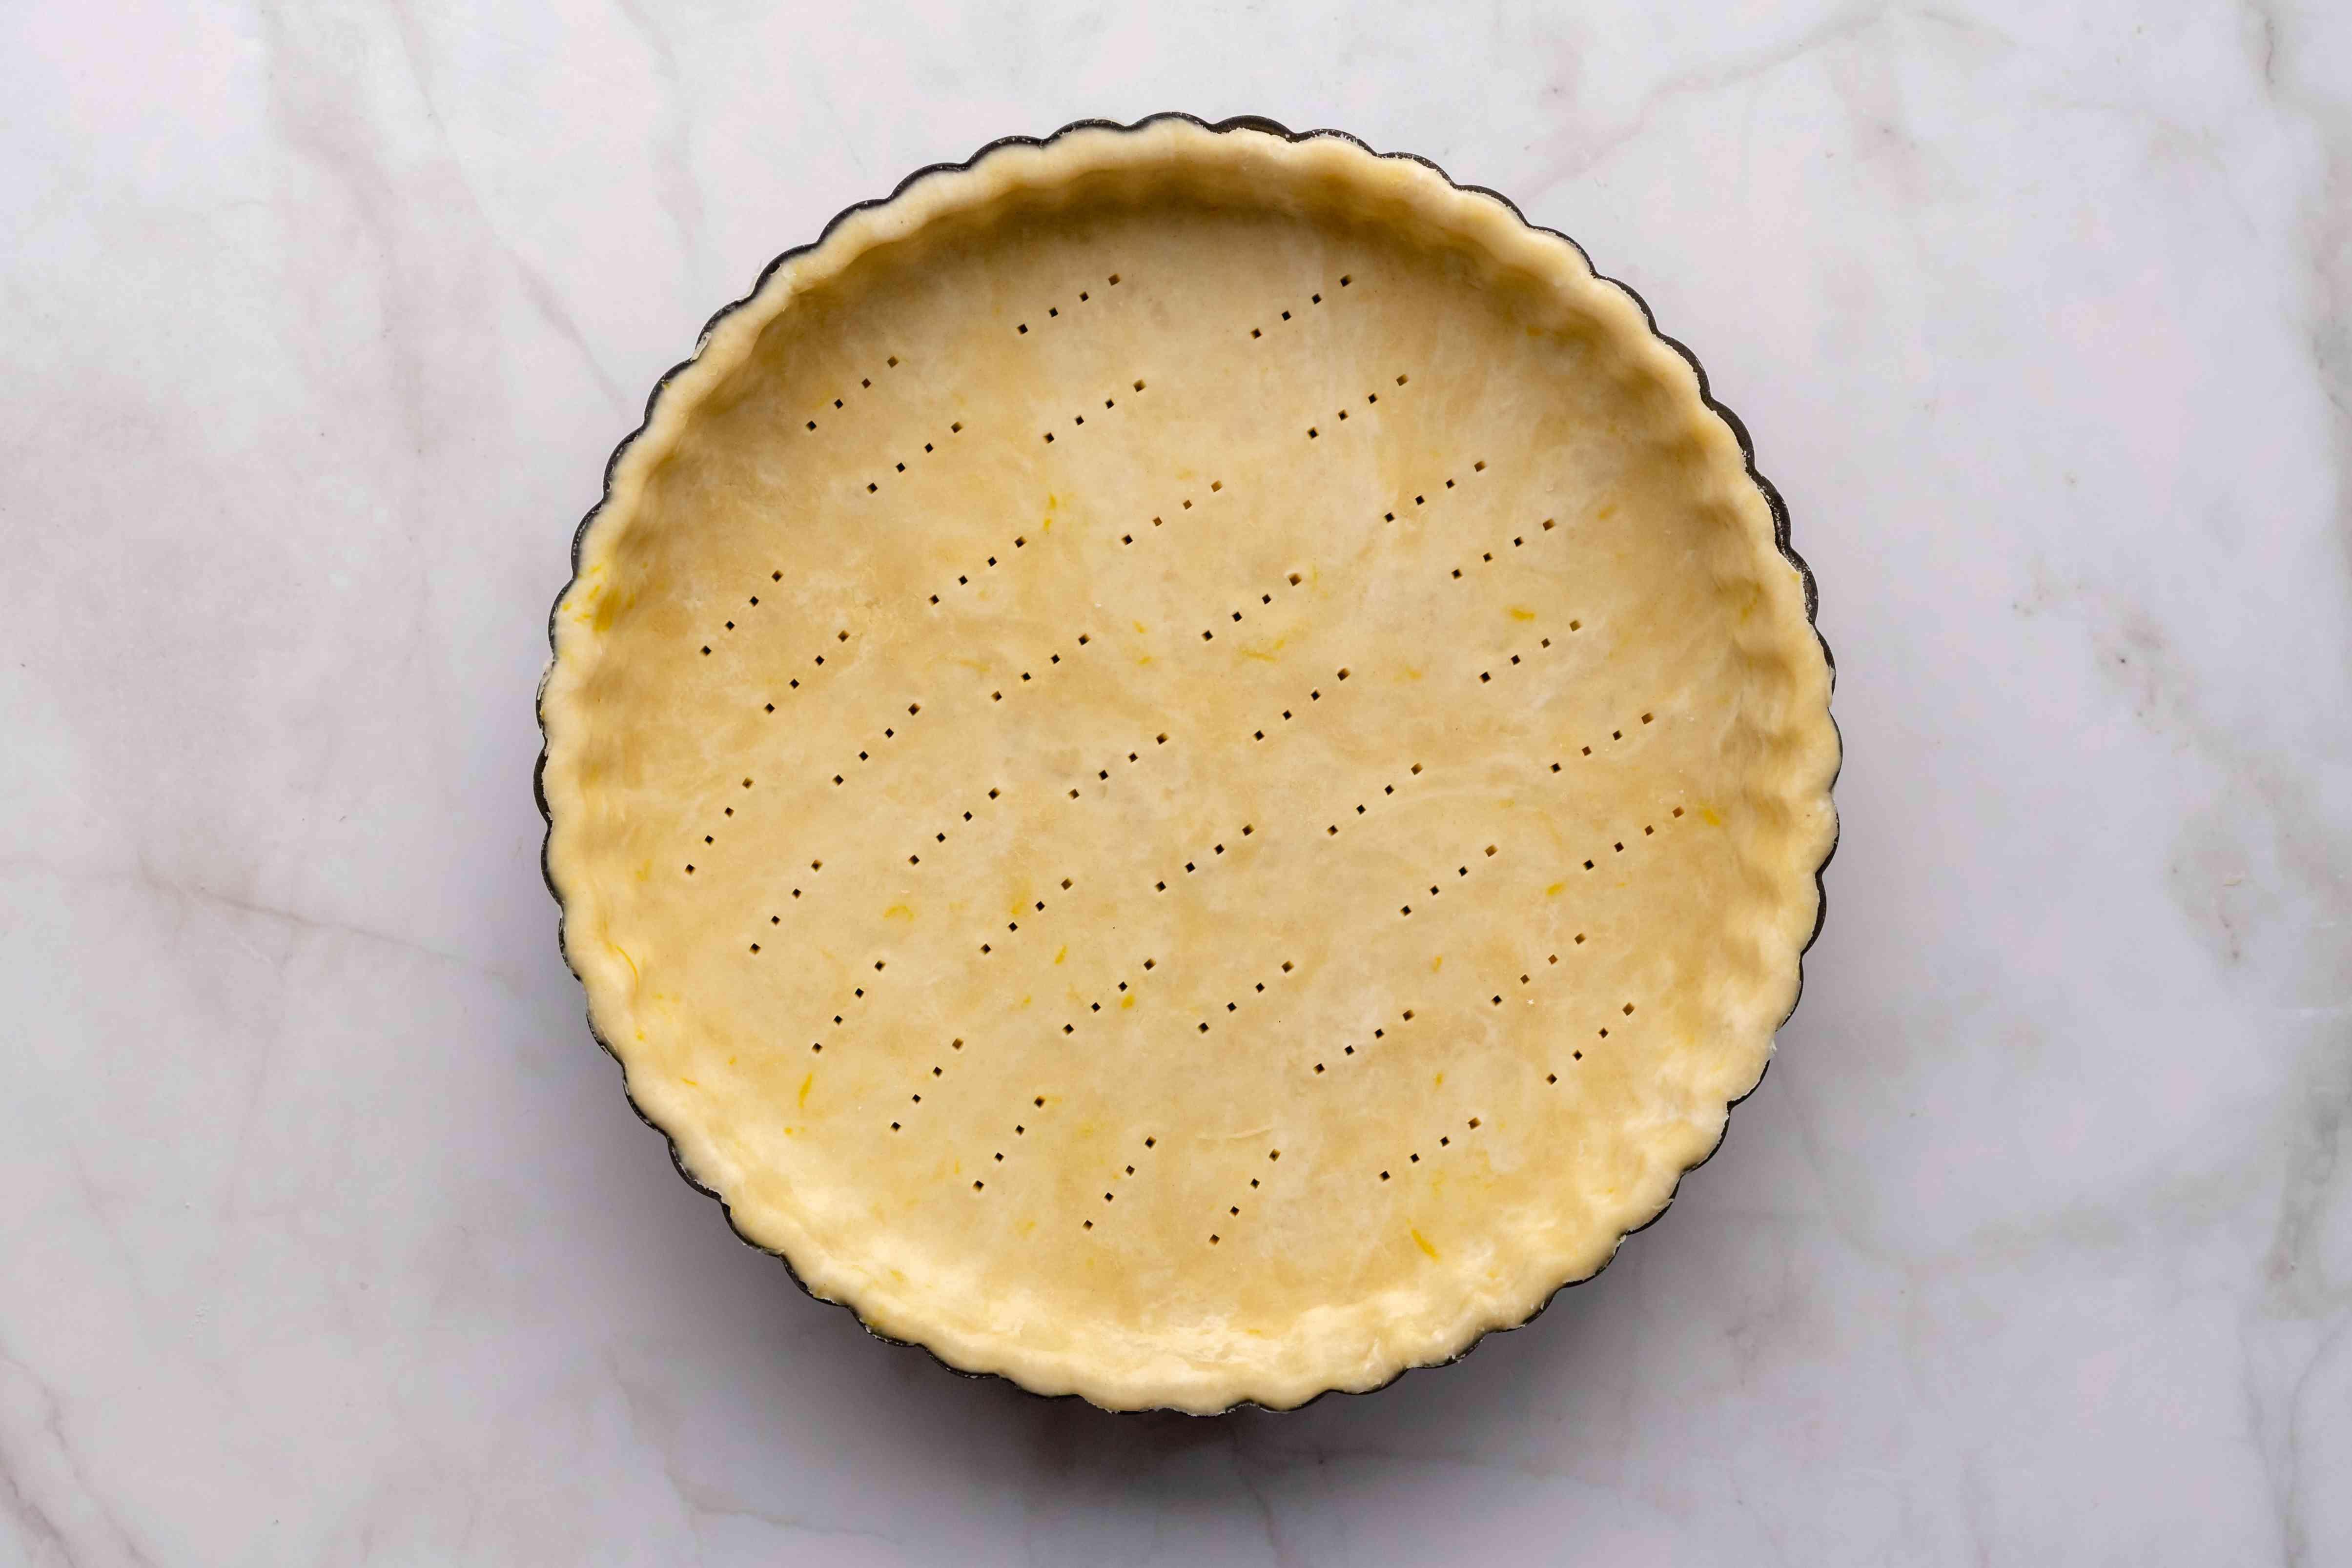 tart dough in a pan, prick the tart shell dough with a fork